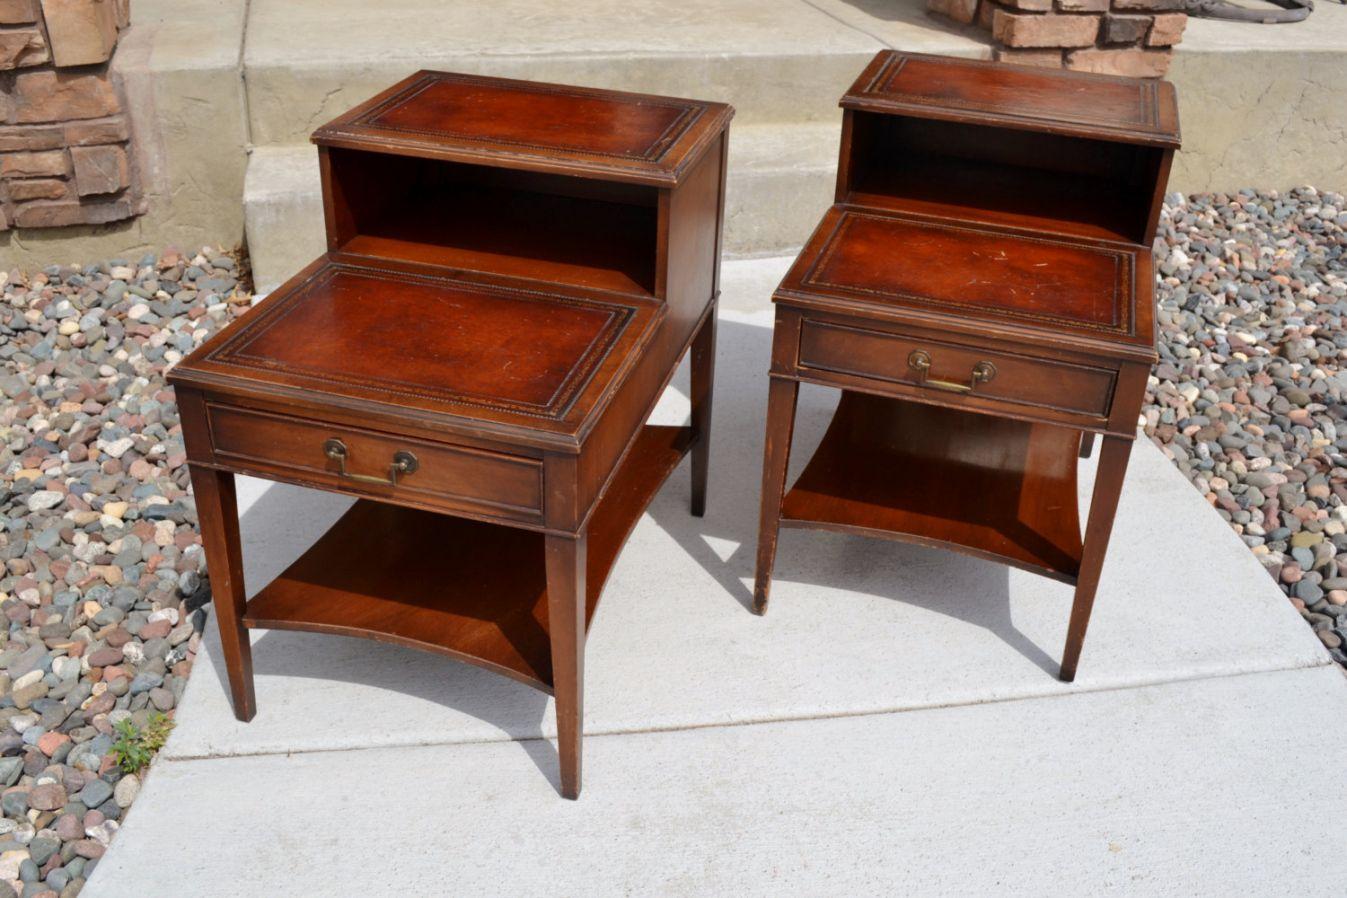 mahogany end table antique modern wood furniture check more at httpwwwnikkitsfuncommahogany end table antique - Antique Mahogany End Tables